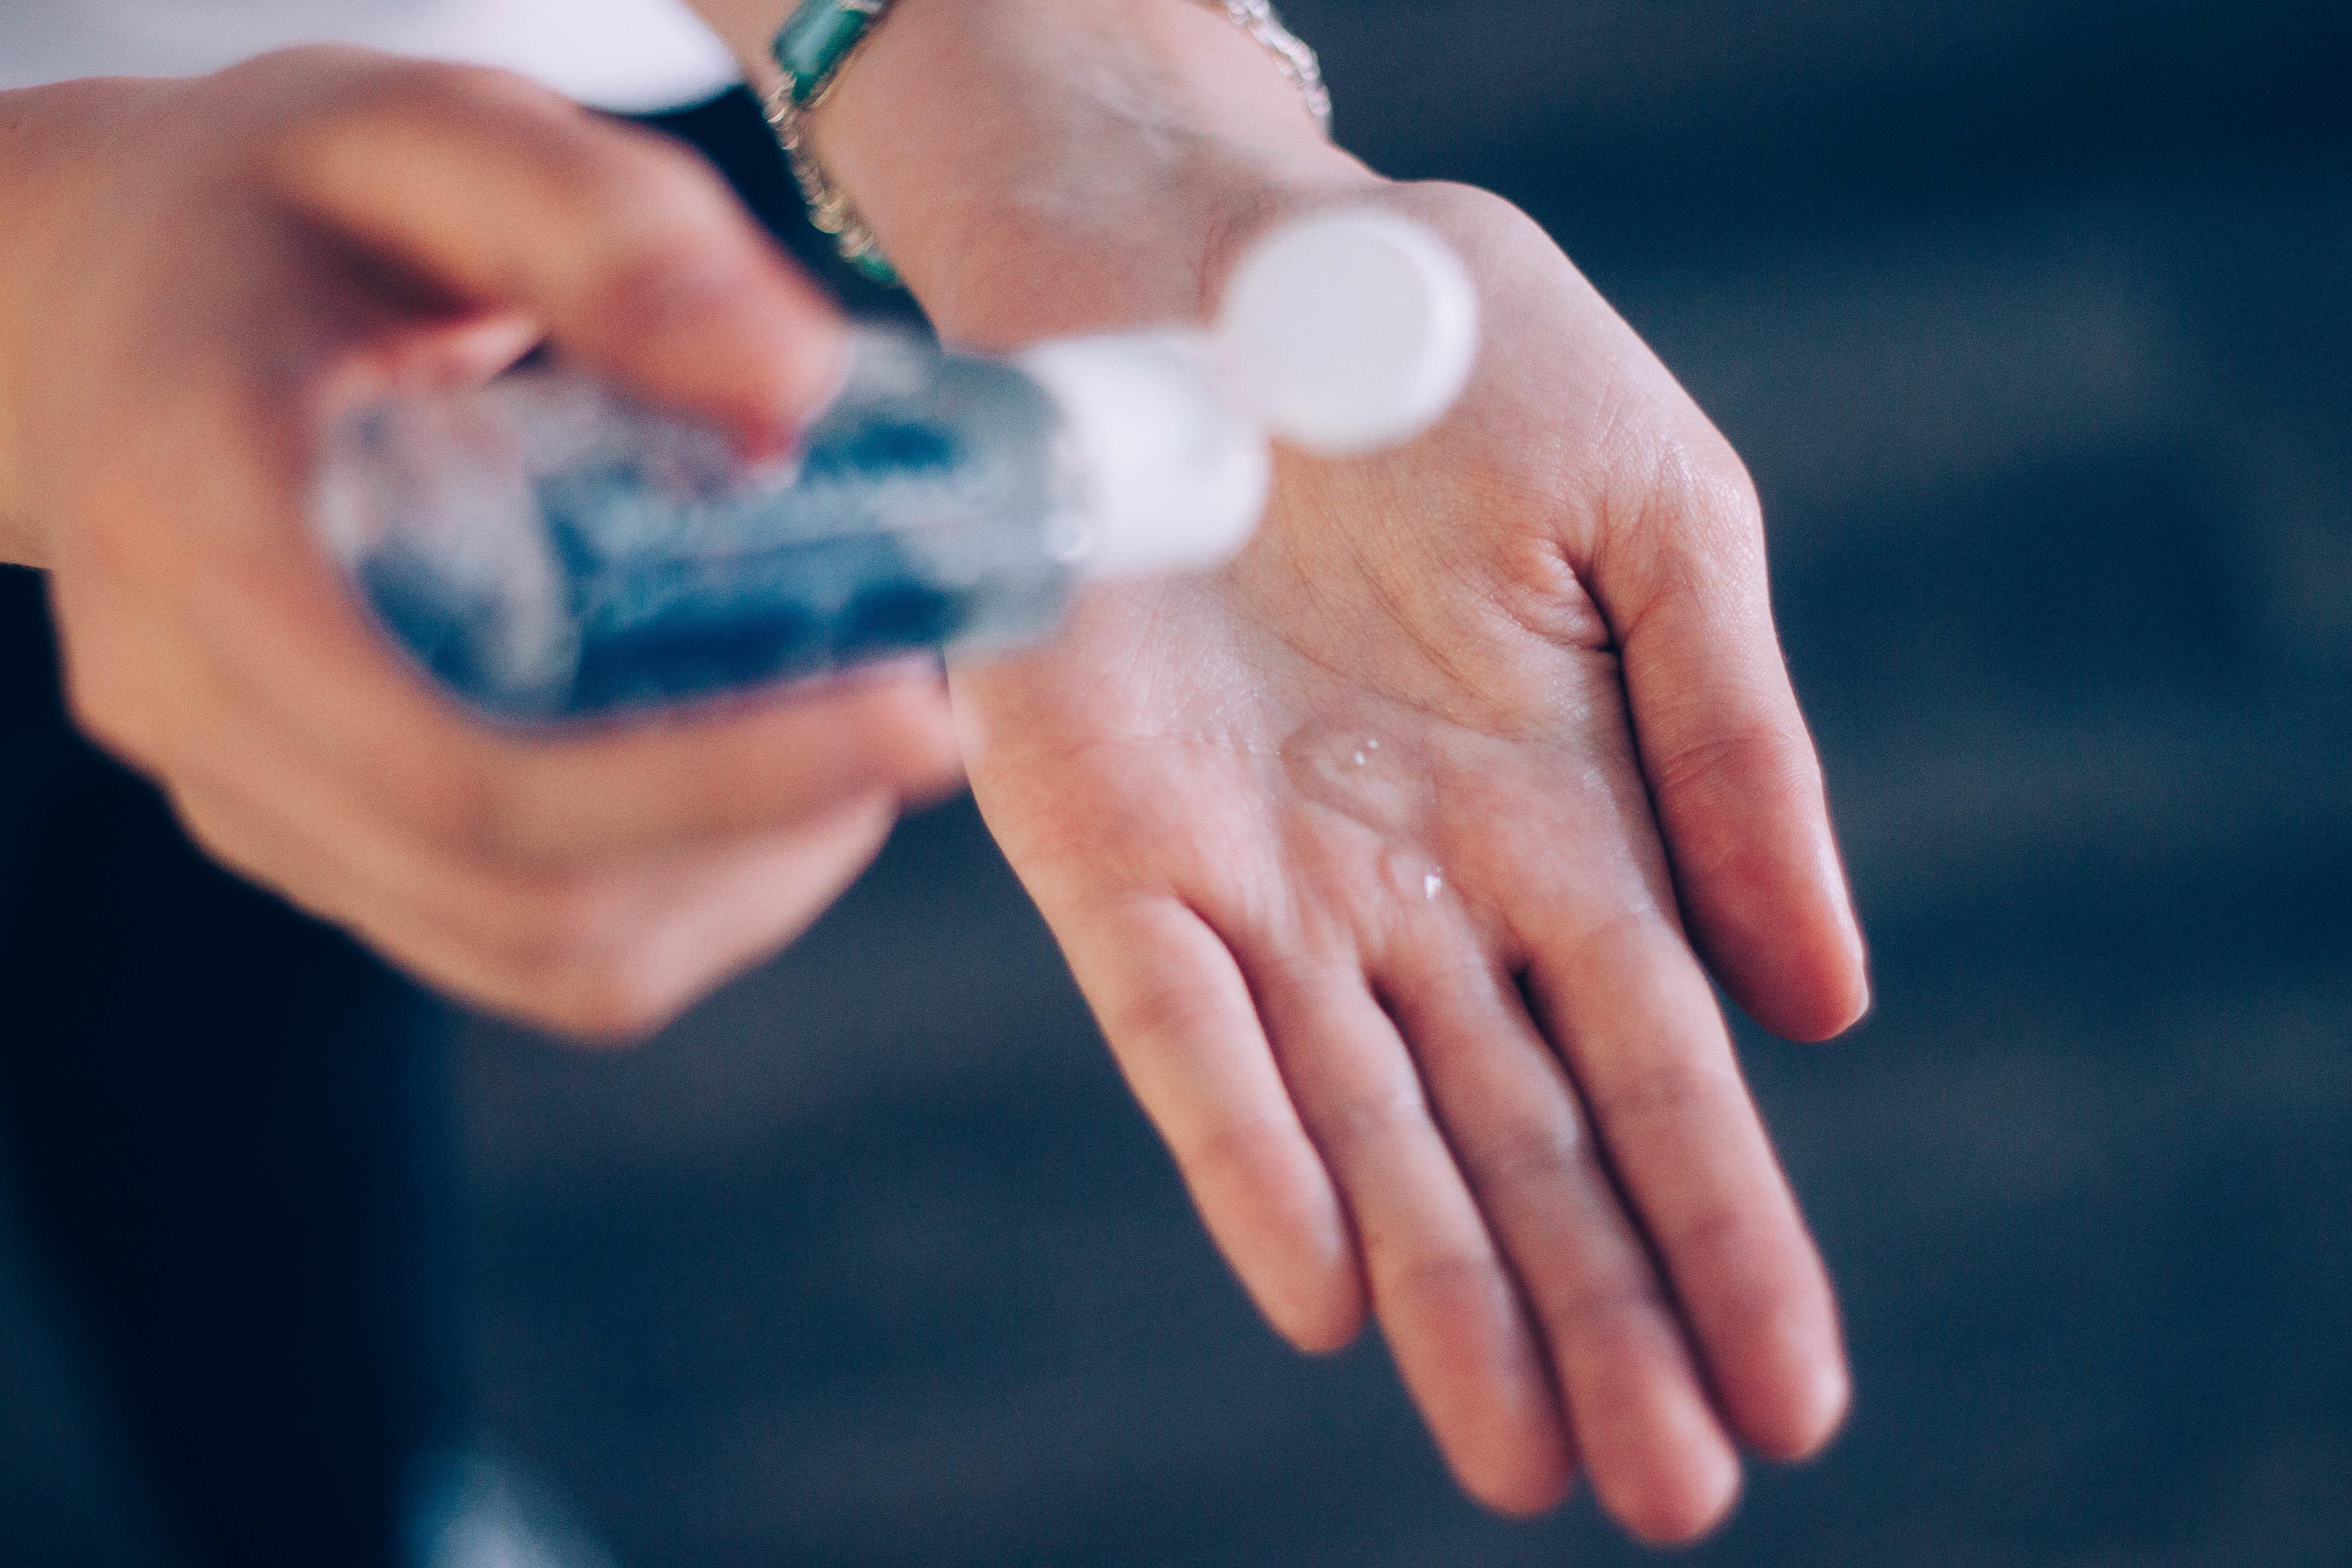 person applying hand sanitizer.